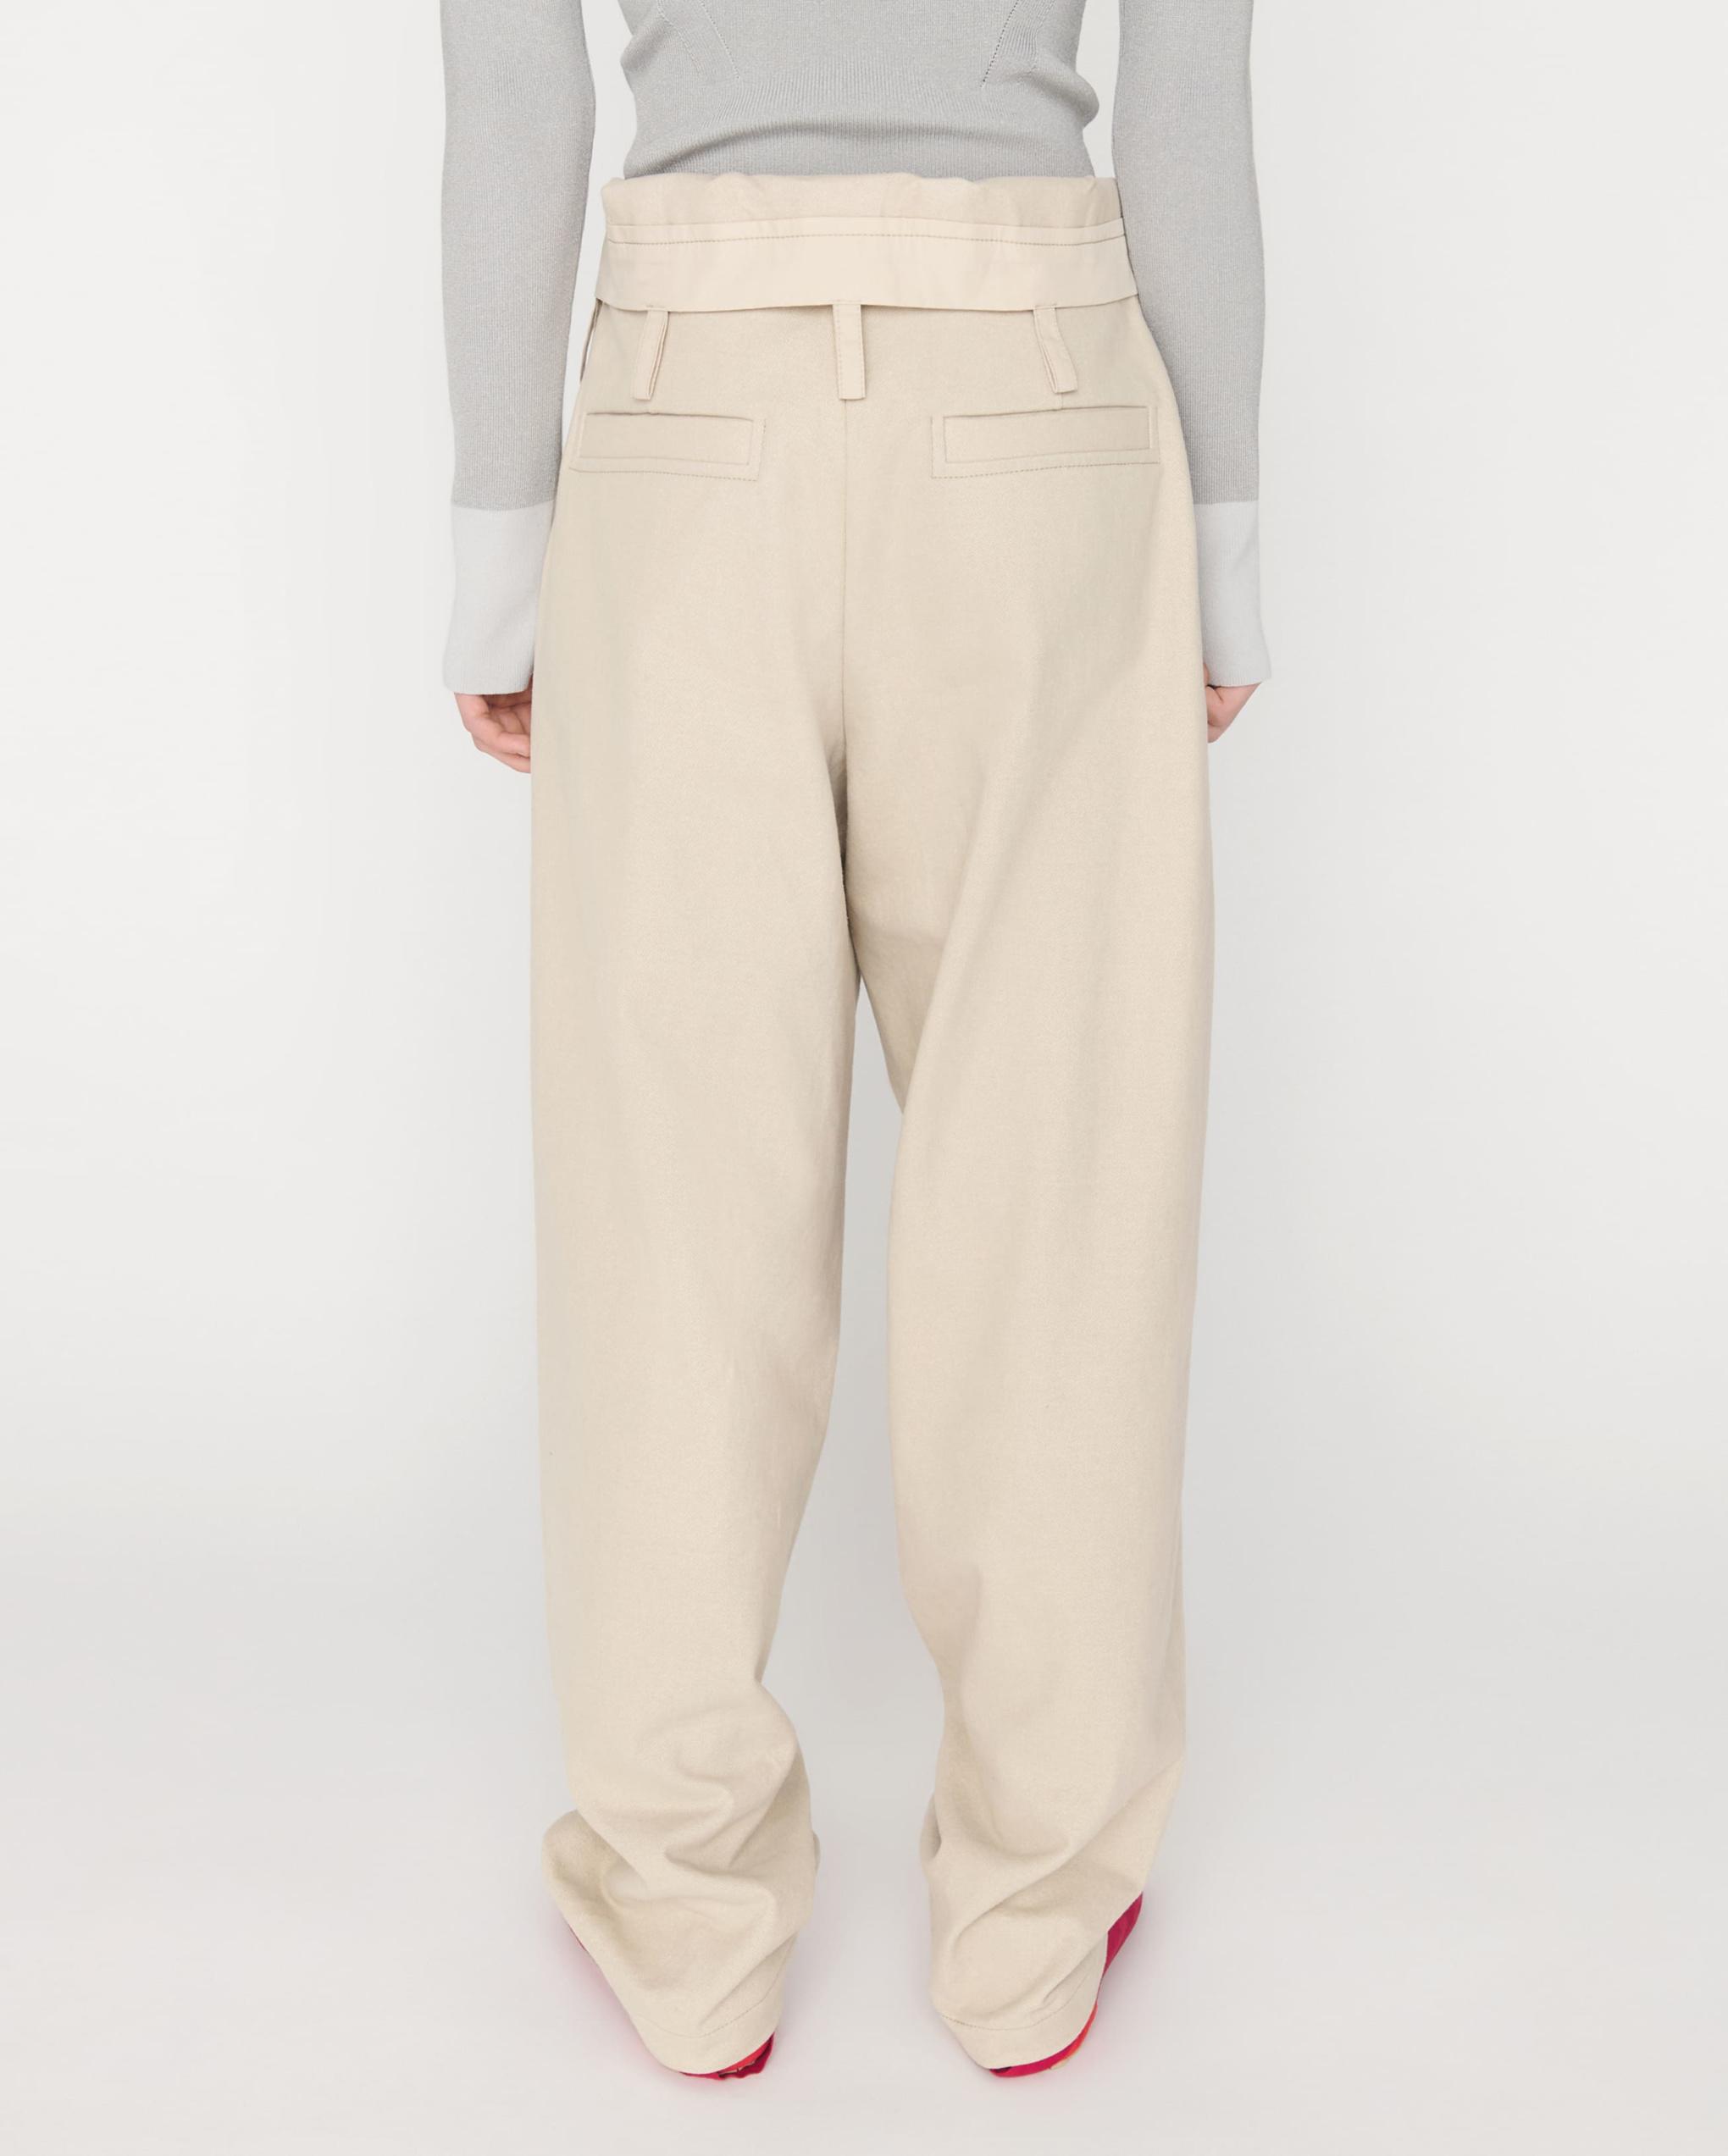 Le pantalon Asao